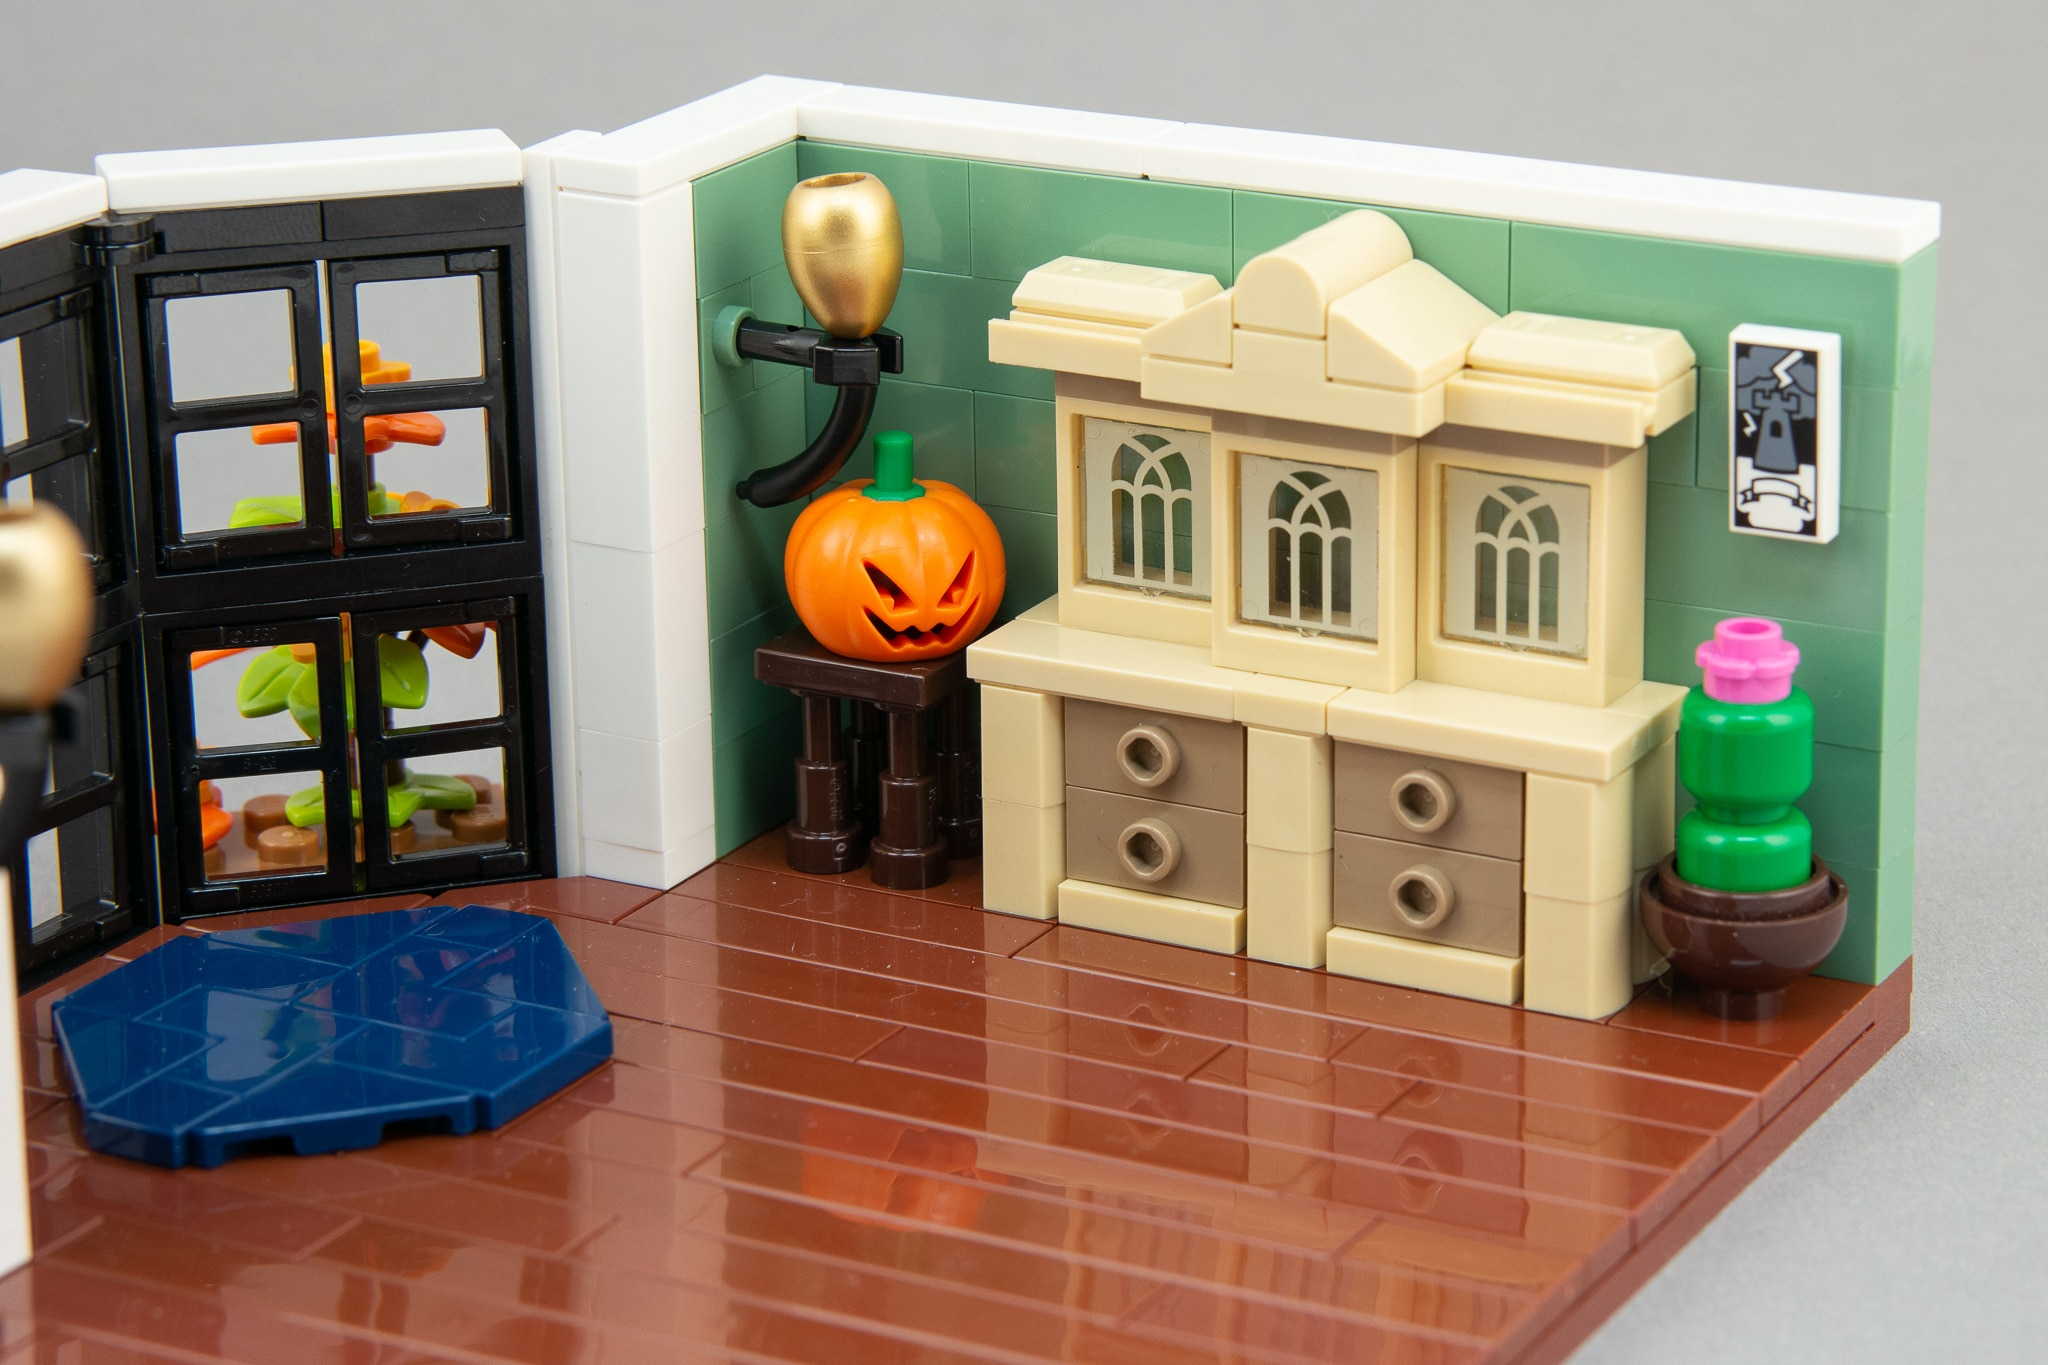 LEGO Moc Bausinpiration Esszimmer (11)